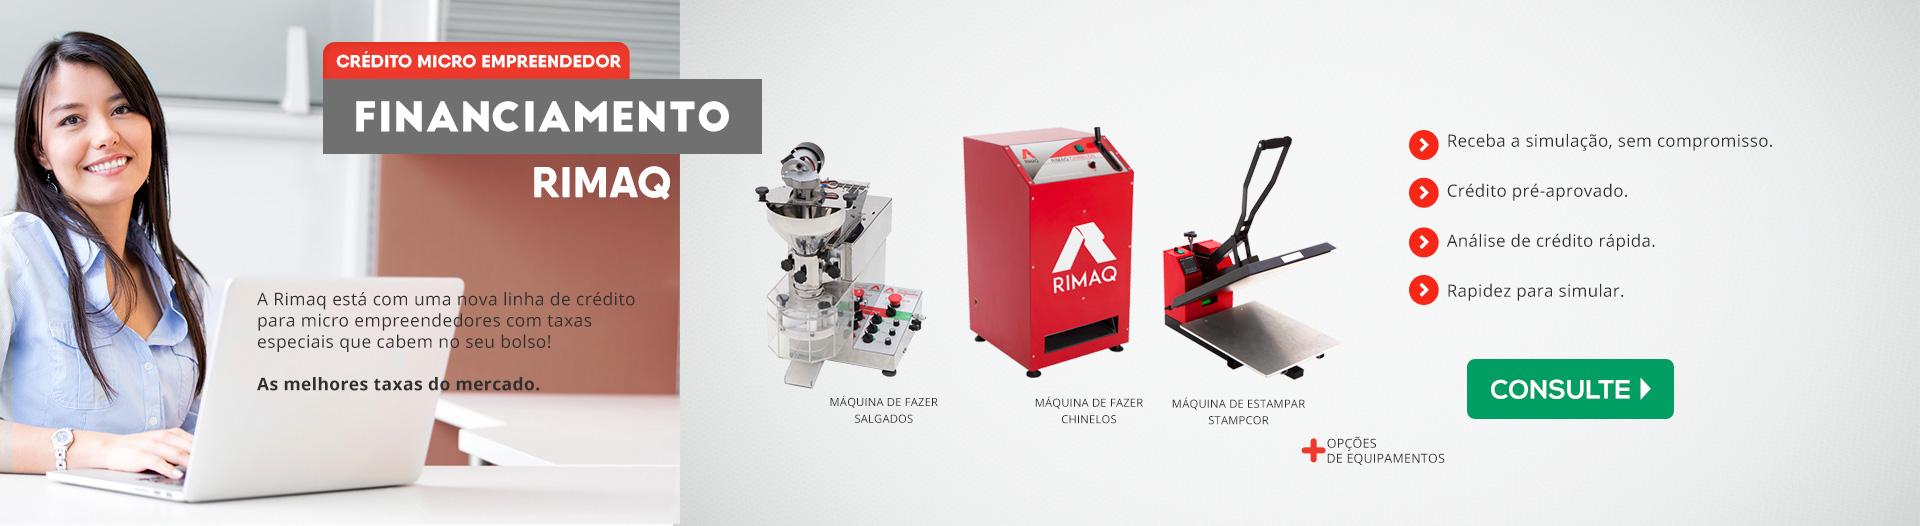 rimaq-financiamento-maquinas